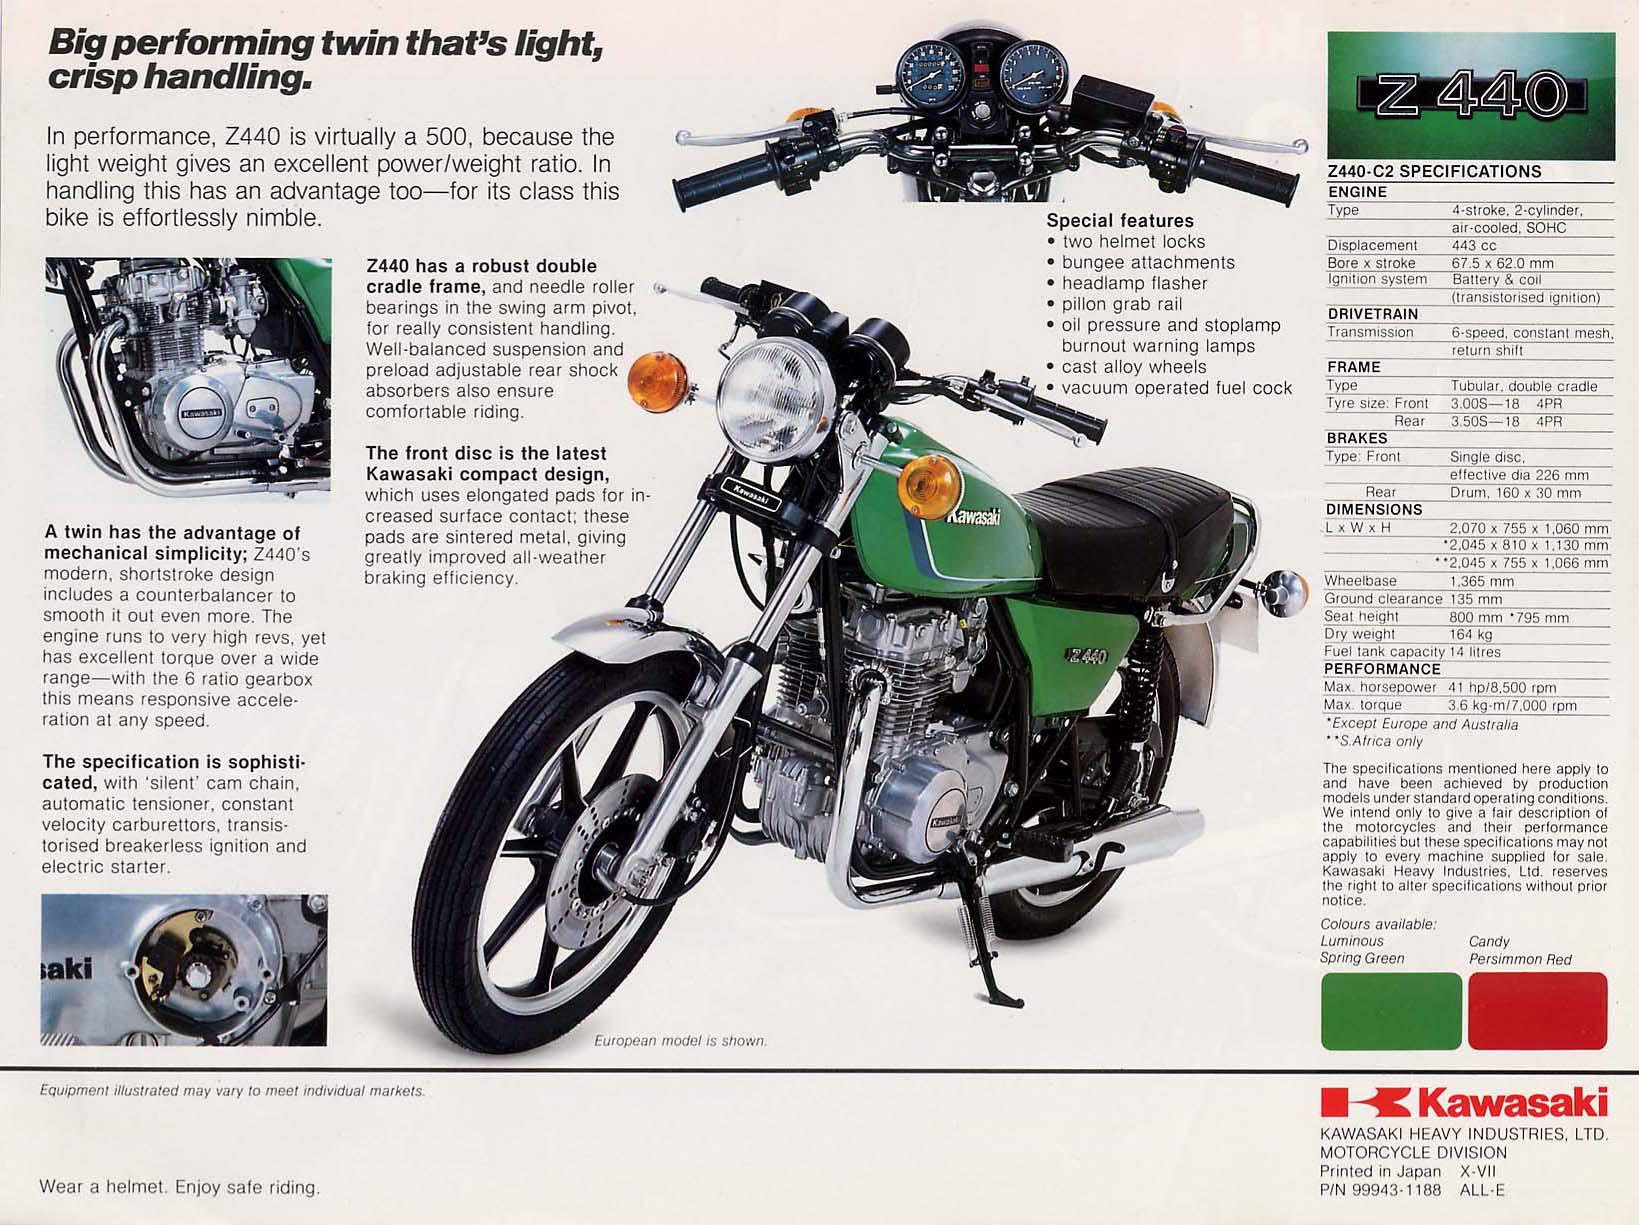 Year, Title, Picture, Description. 1979, Kawasaki KZ400 LTD 440